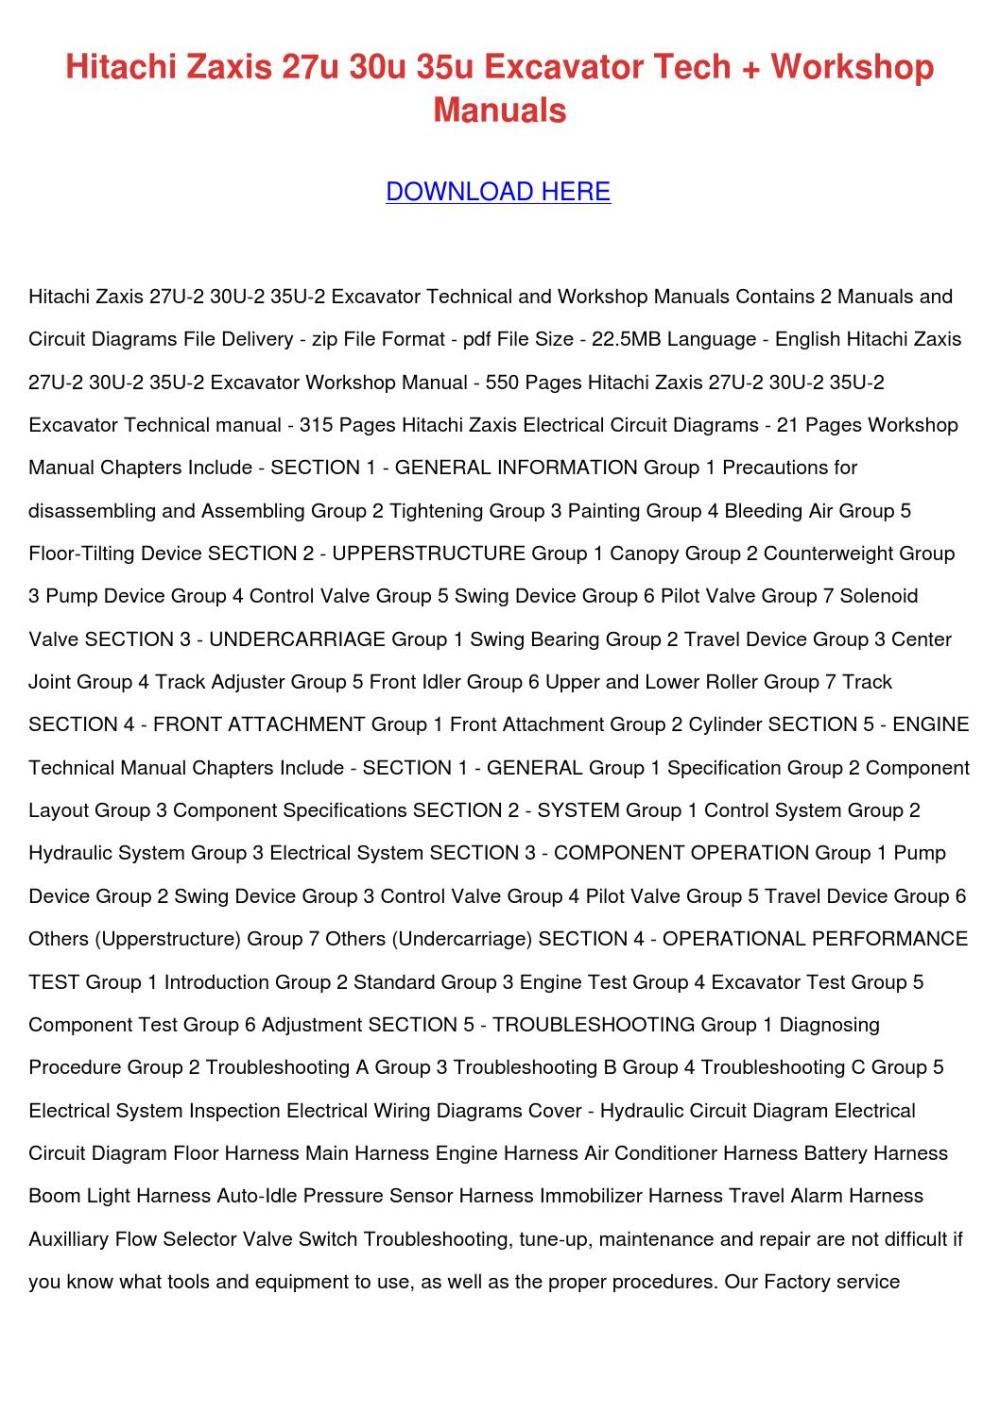 medium resolution of hitachi zaxis 27u 30u 35u excavator tech work